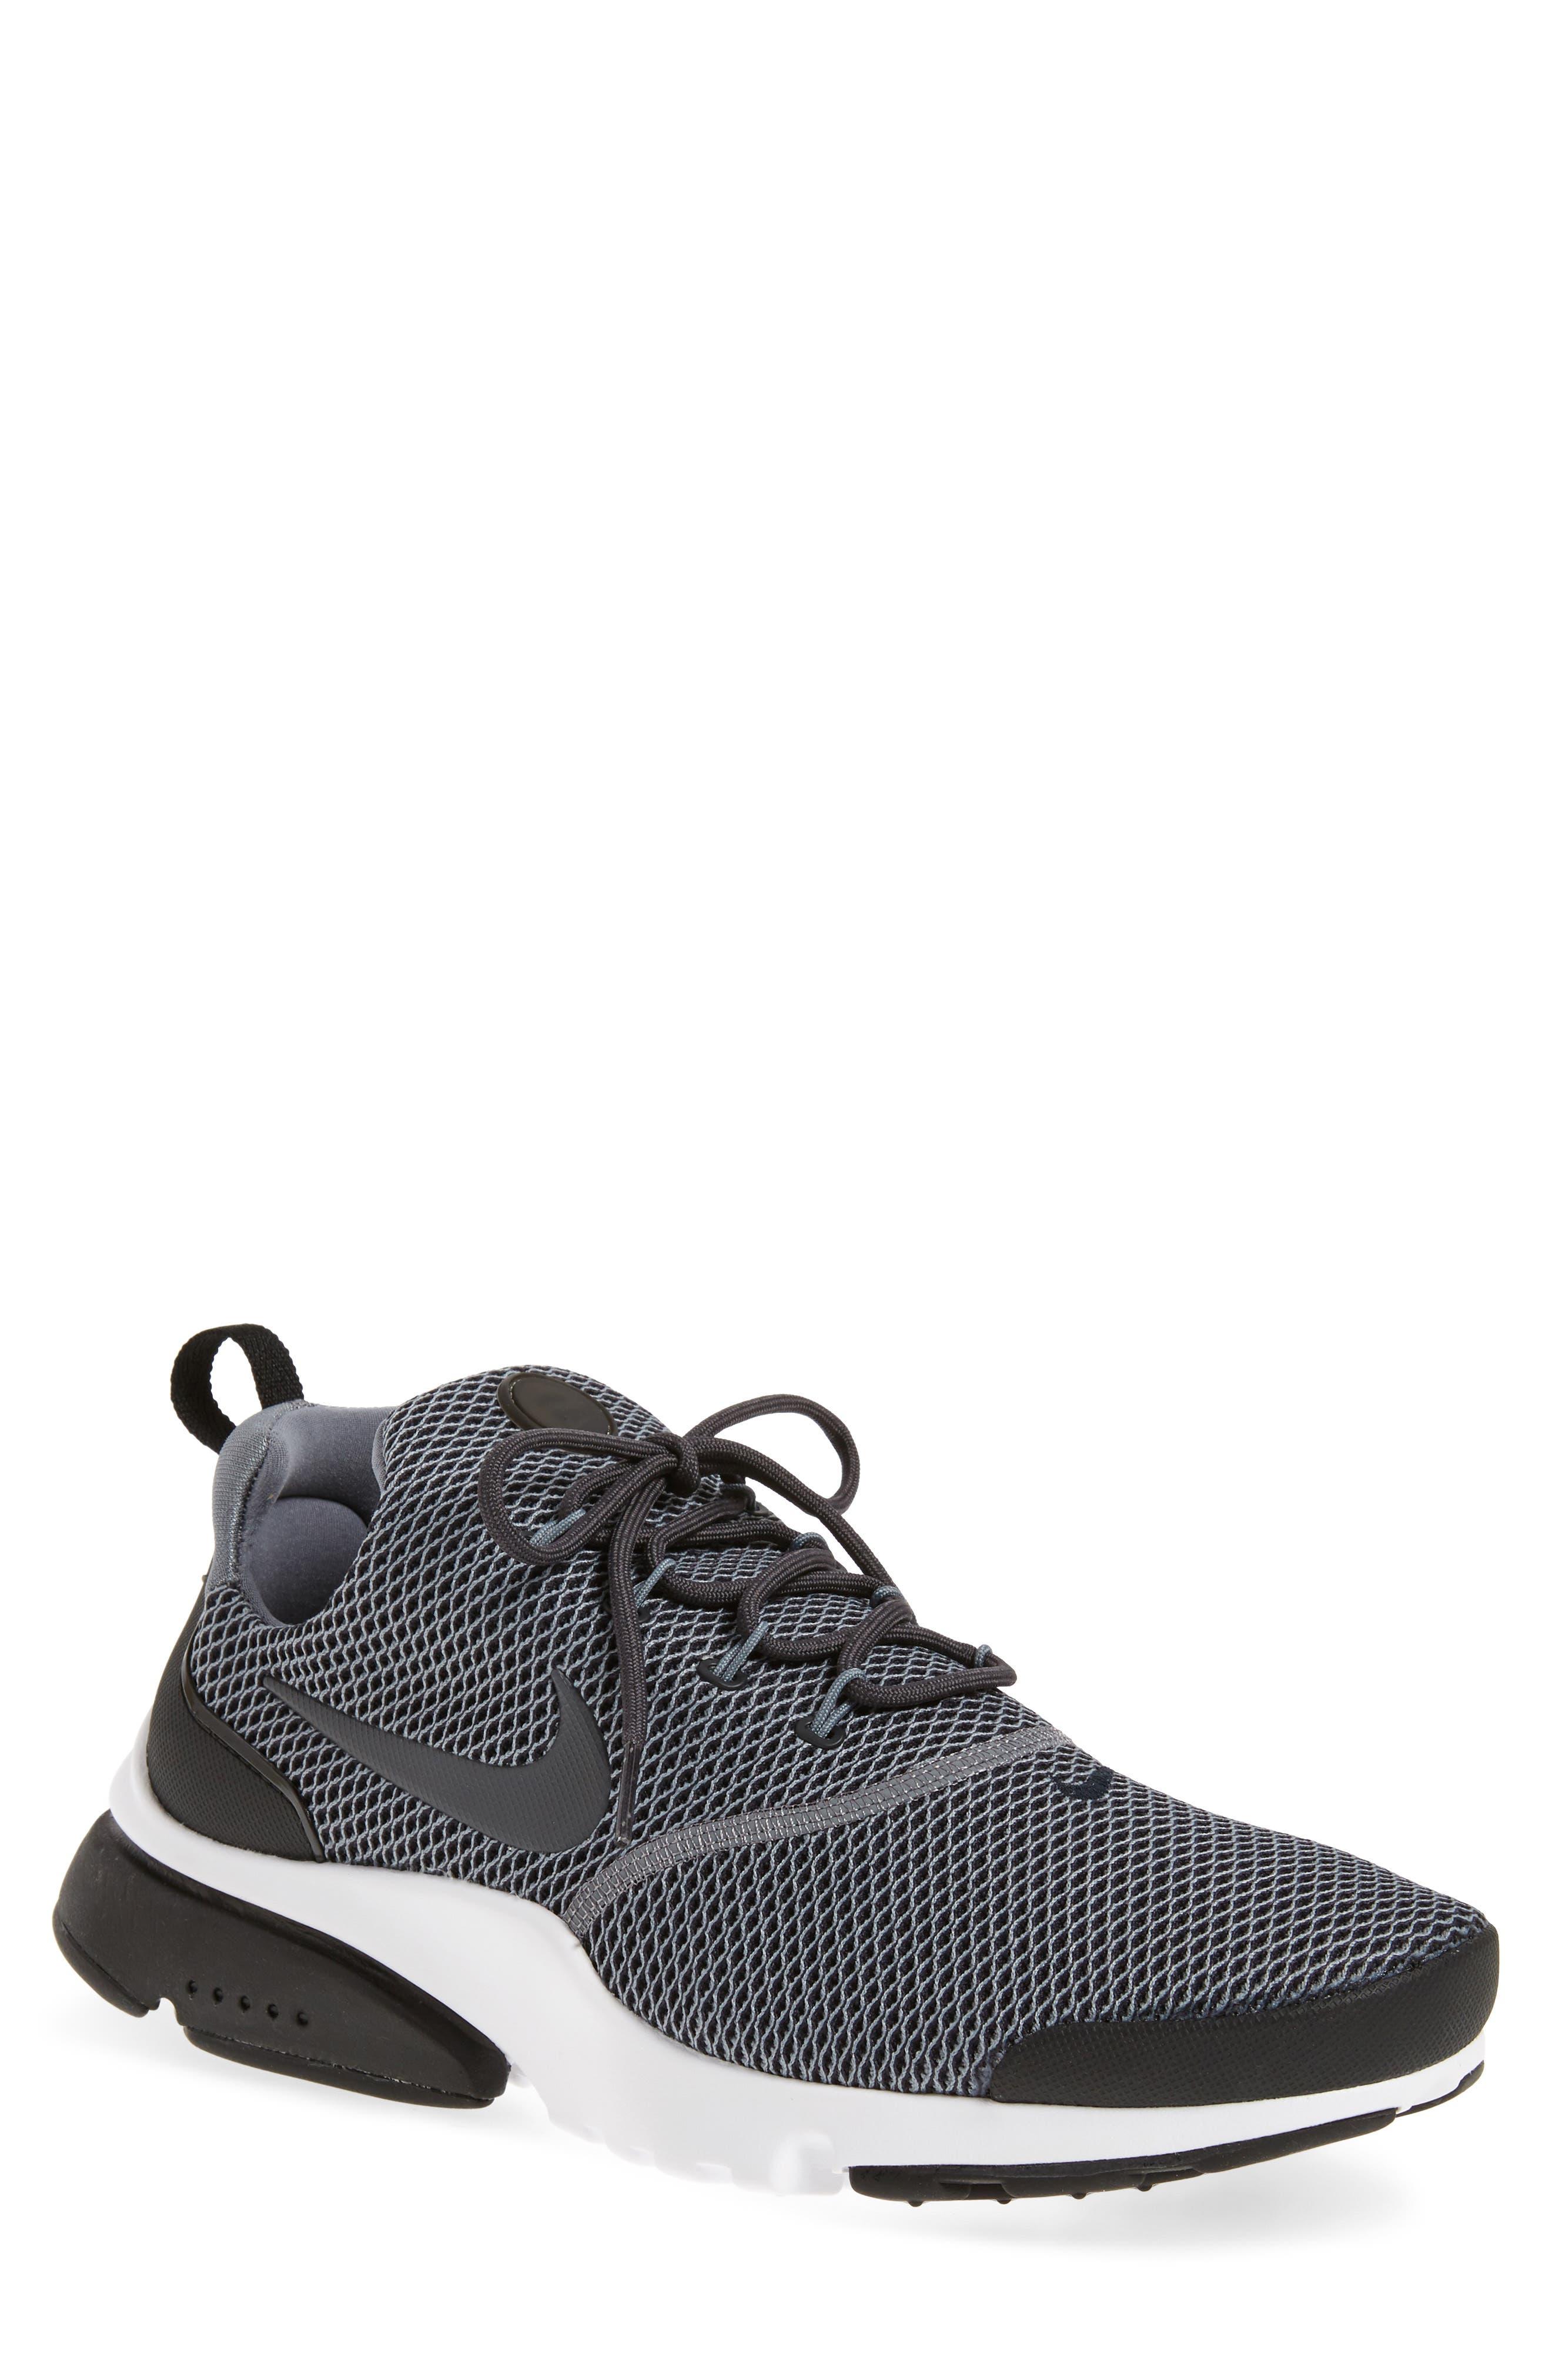 Presto Fly SE Sneaker,                             Main thumbnail 2, color,